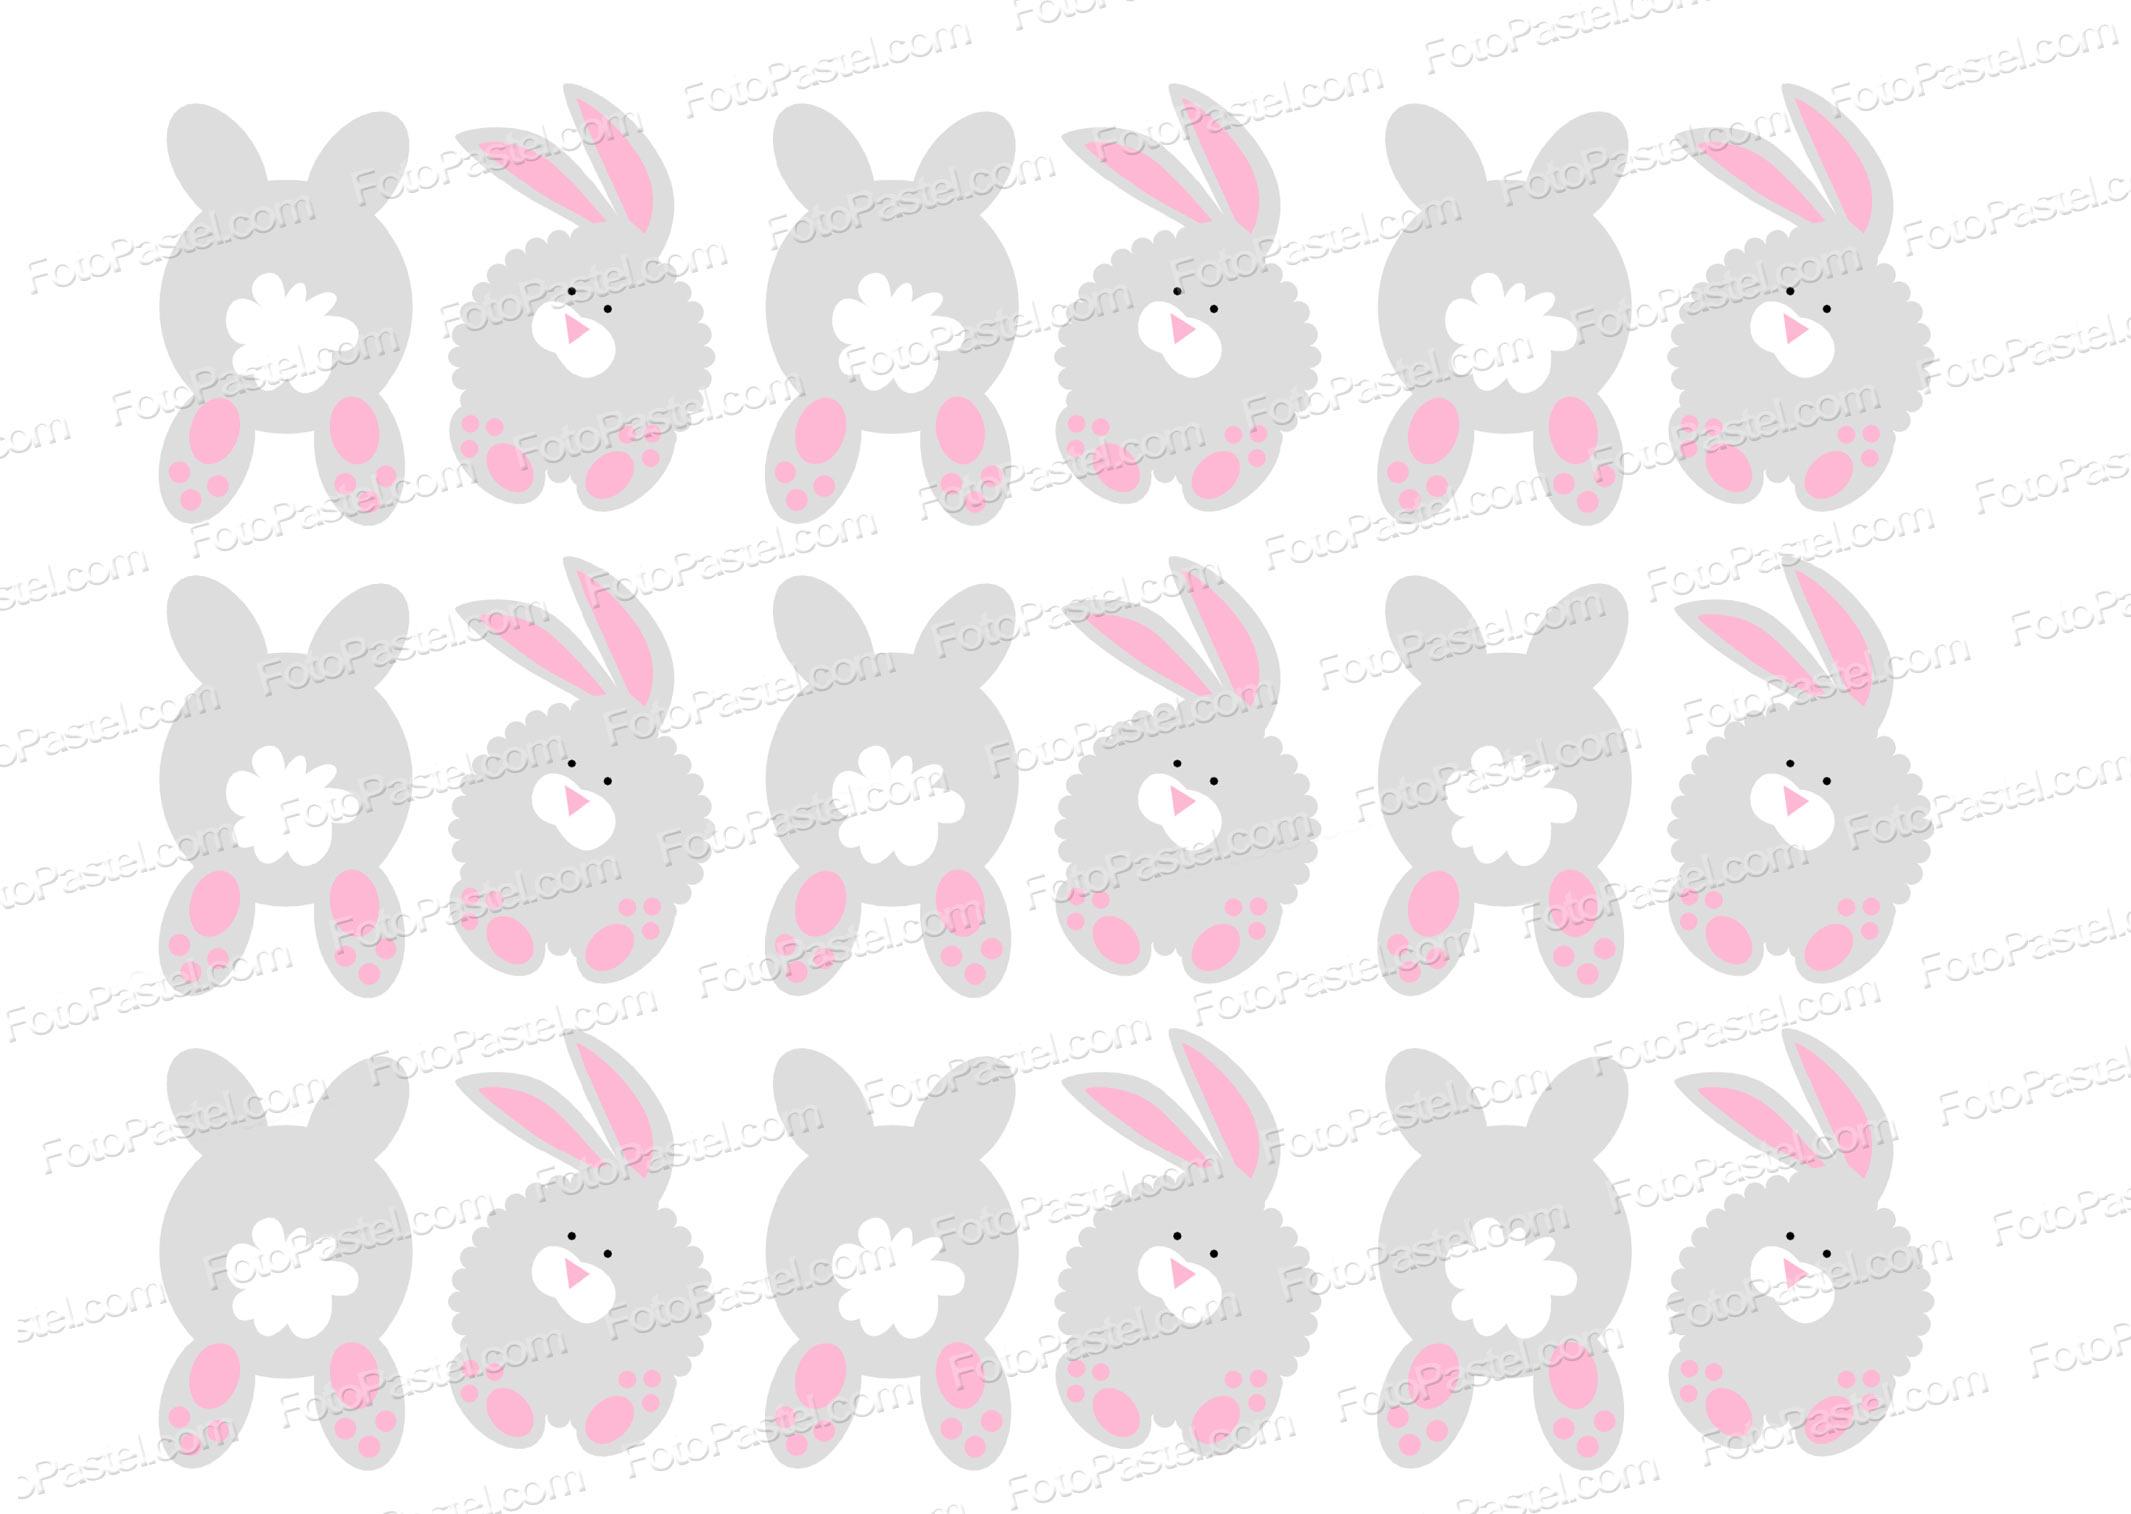 Conejitos de pascua en papel de arroz precortado fpdpp04 for Papel decorado rosa